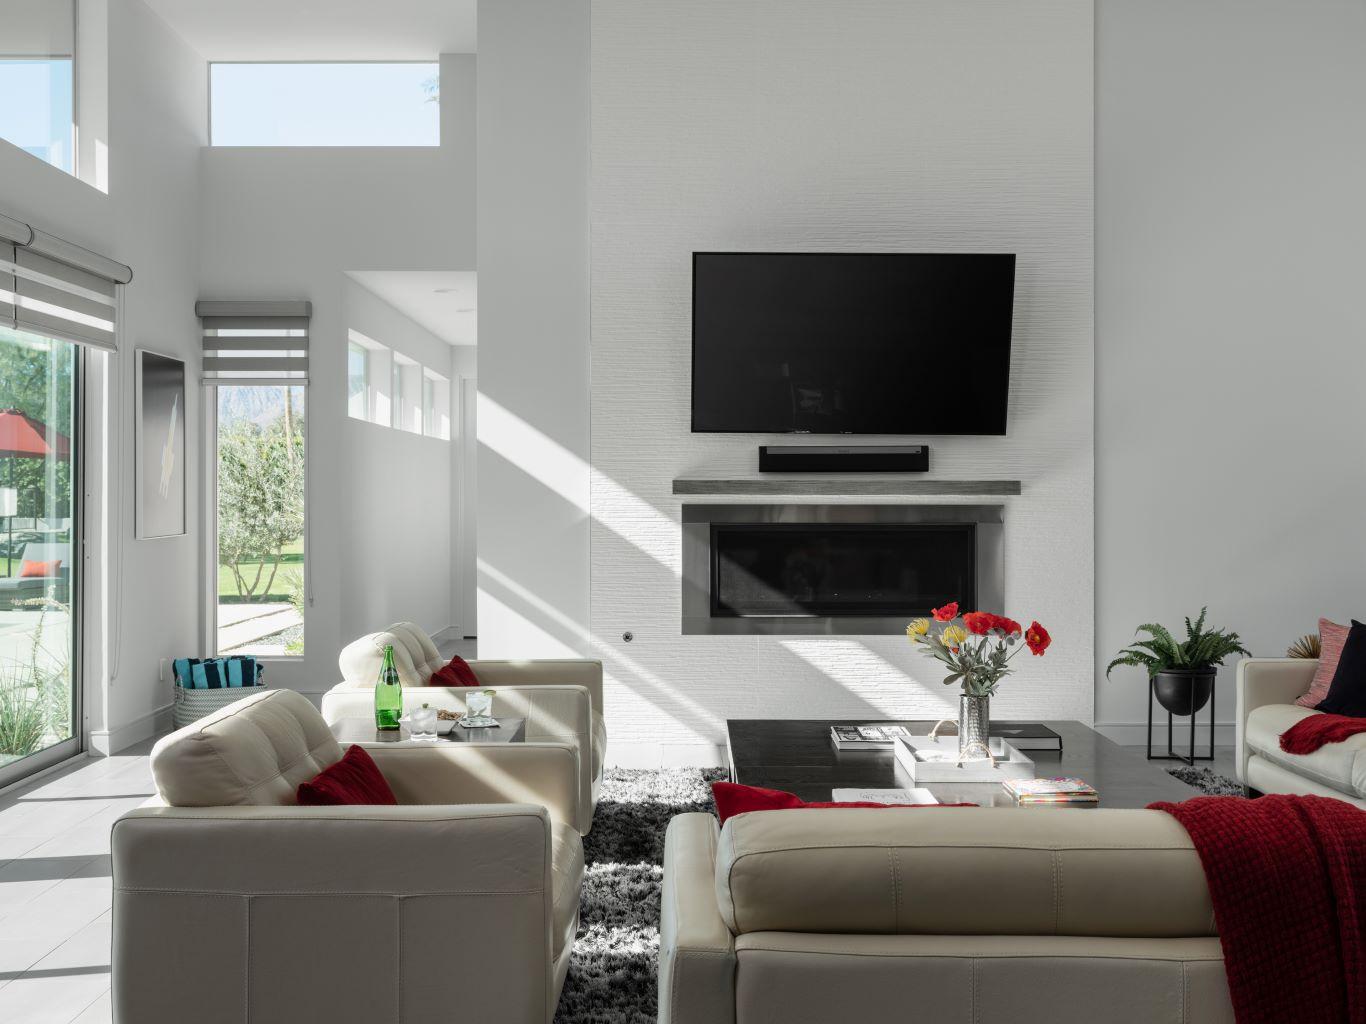 Large Screen TV & Fireplace